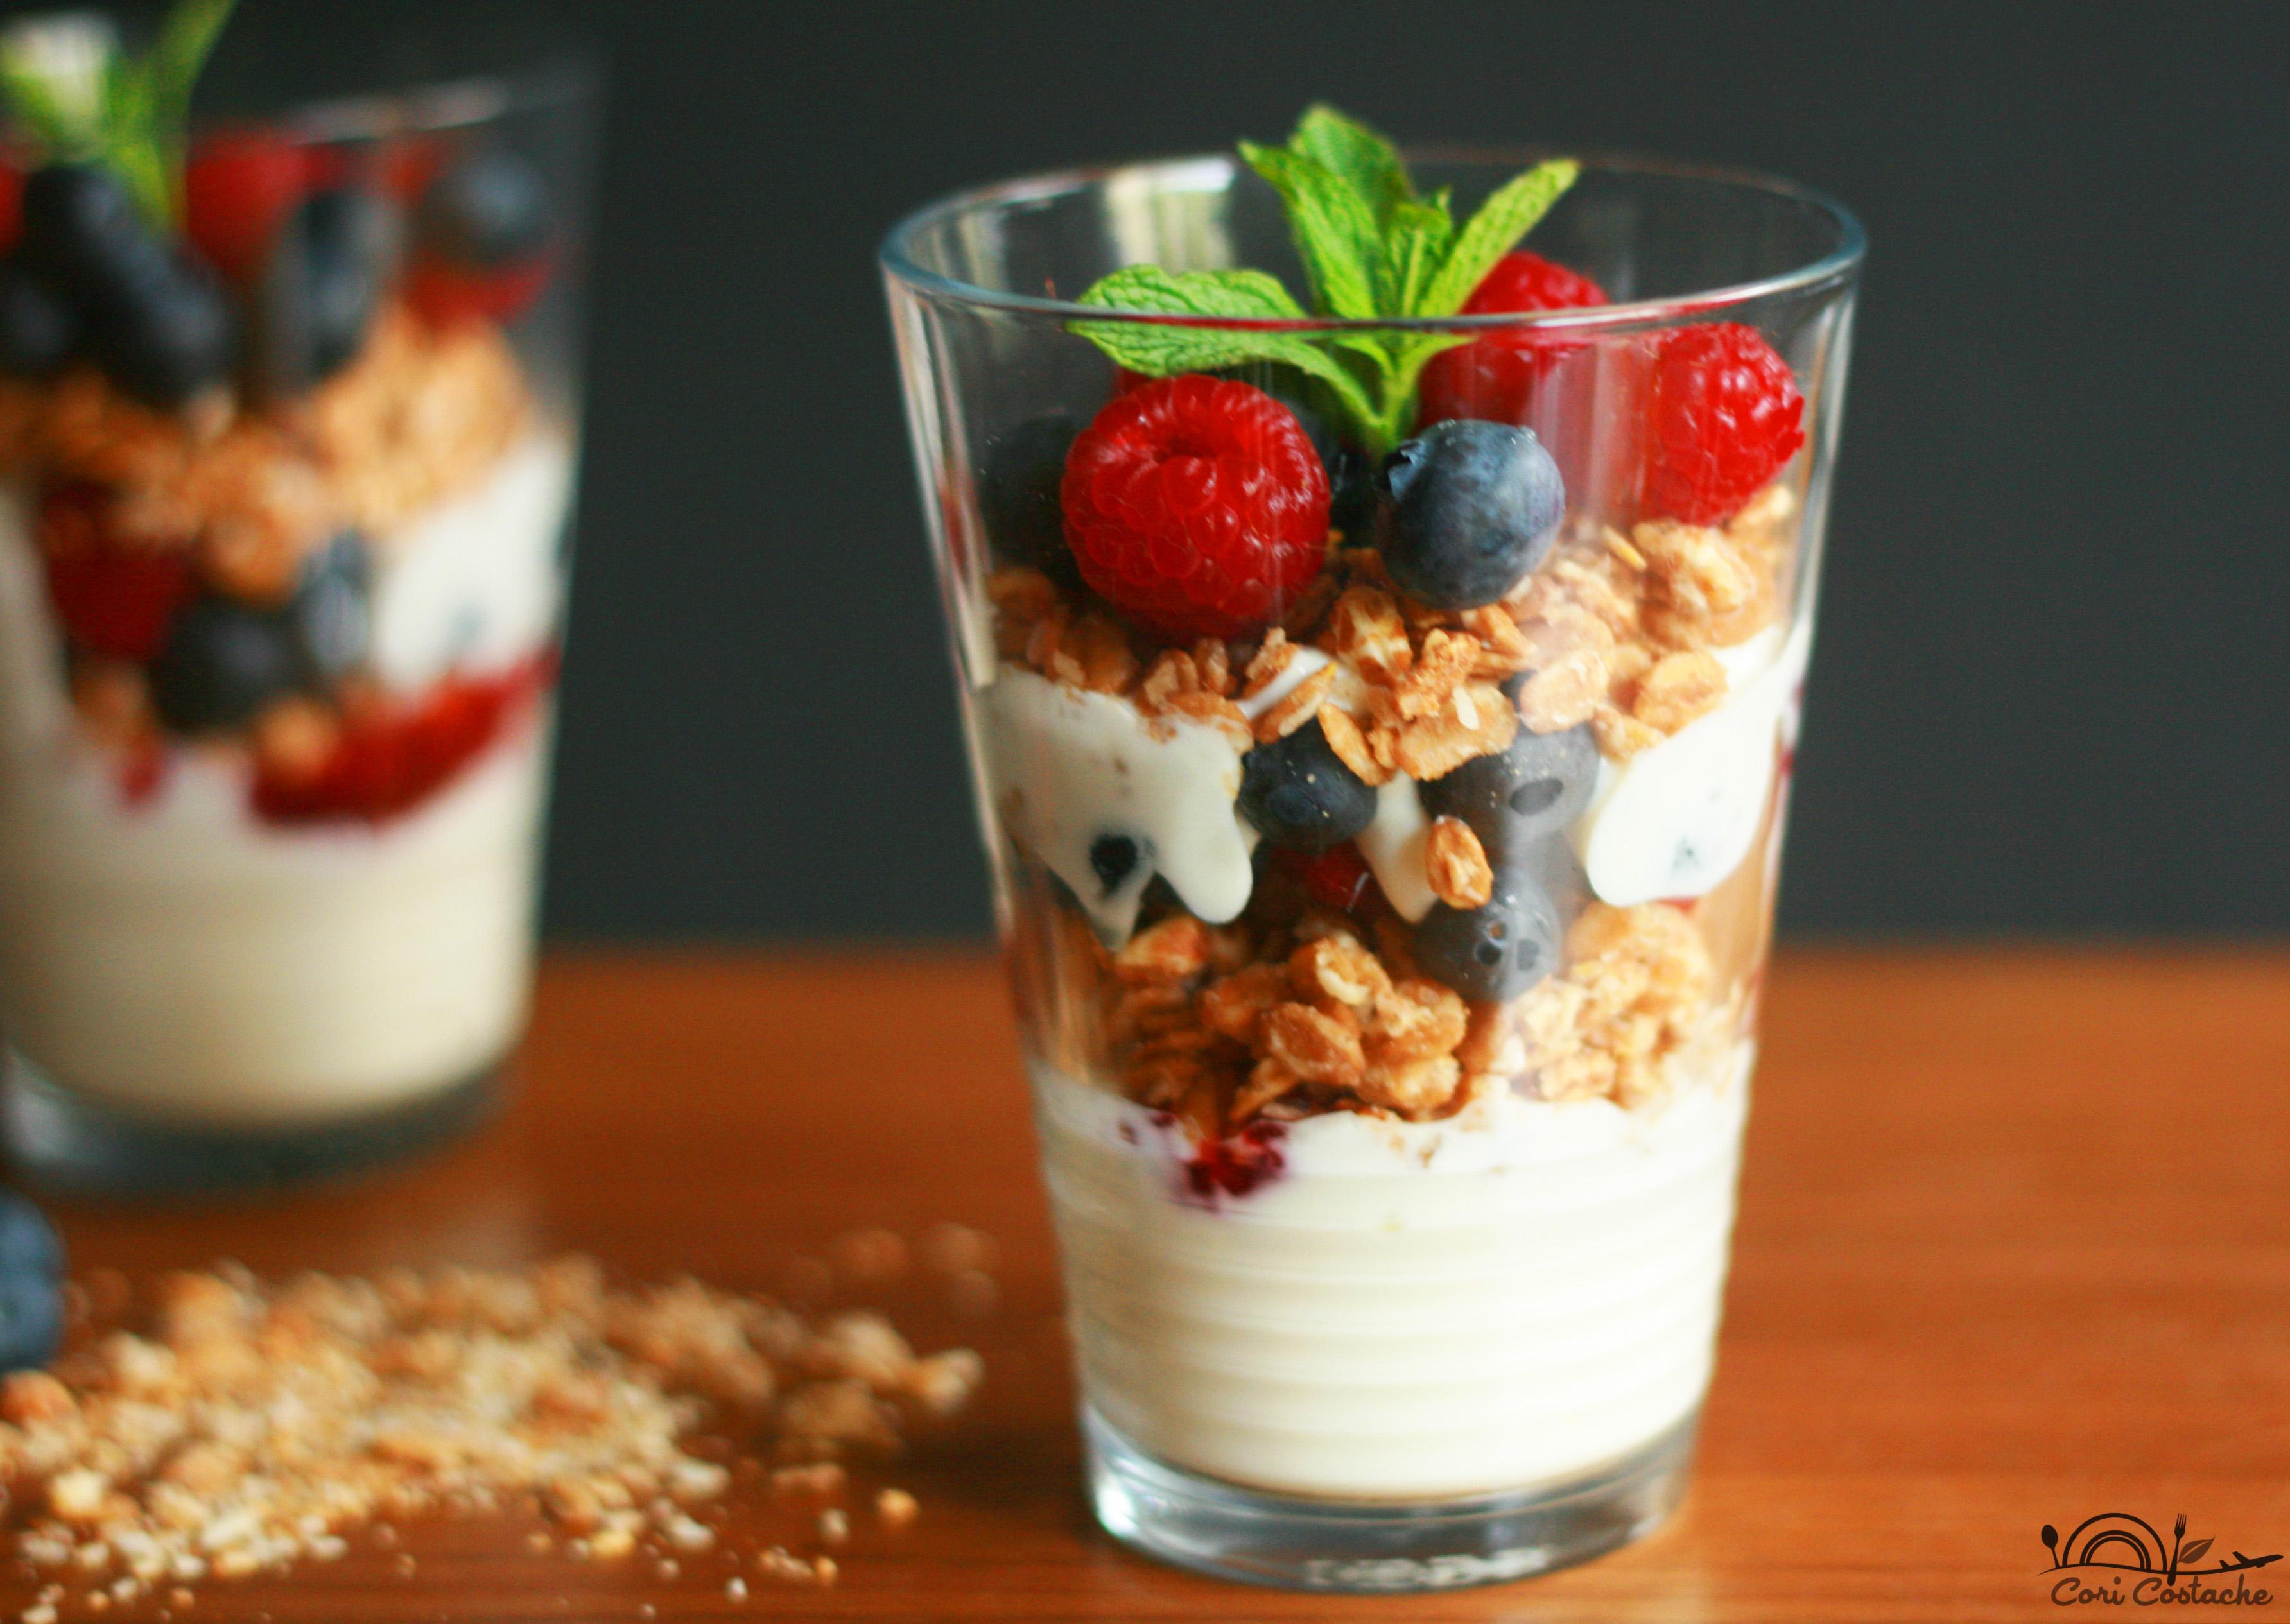 Morning glory Berry greek yougurt parfait